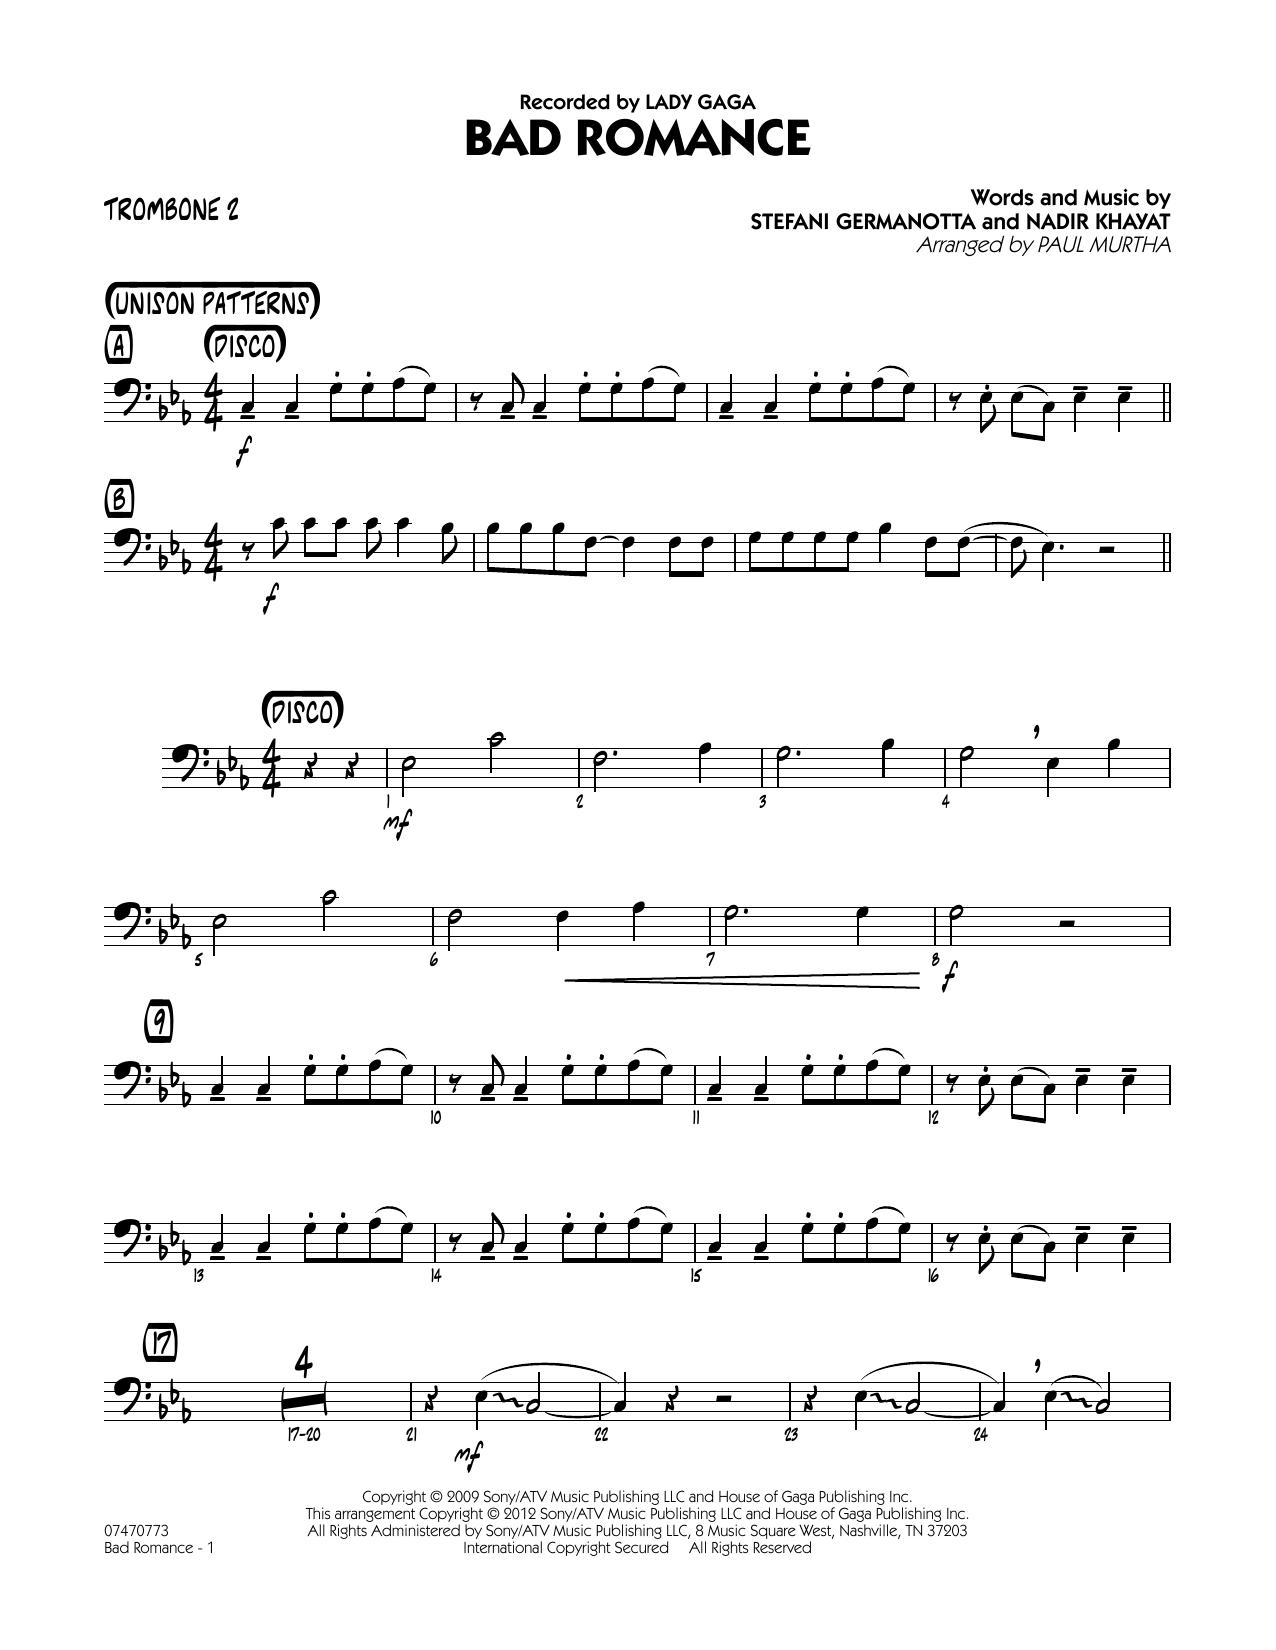 Bad Romance - Trombone 2 Sheet Music